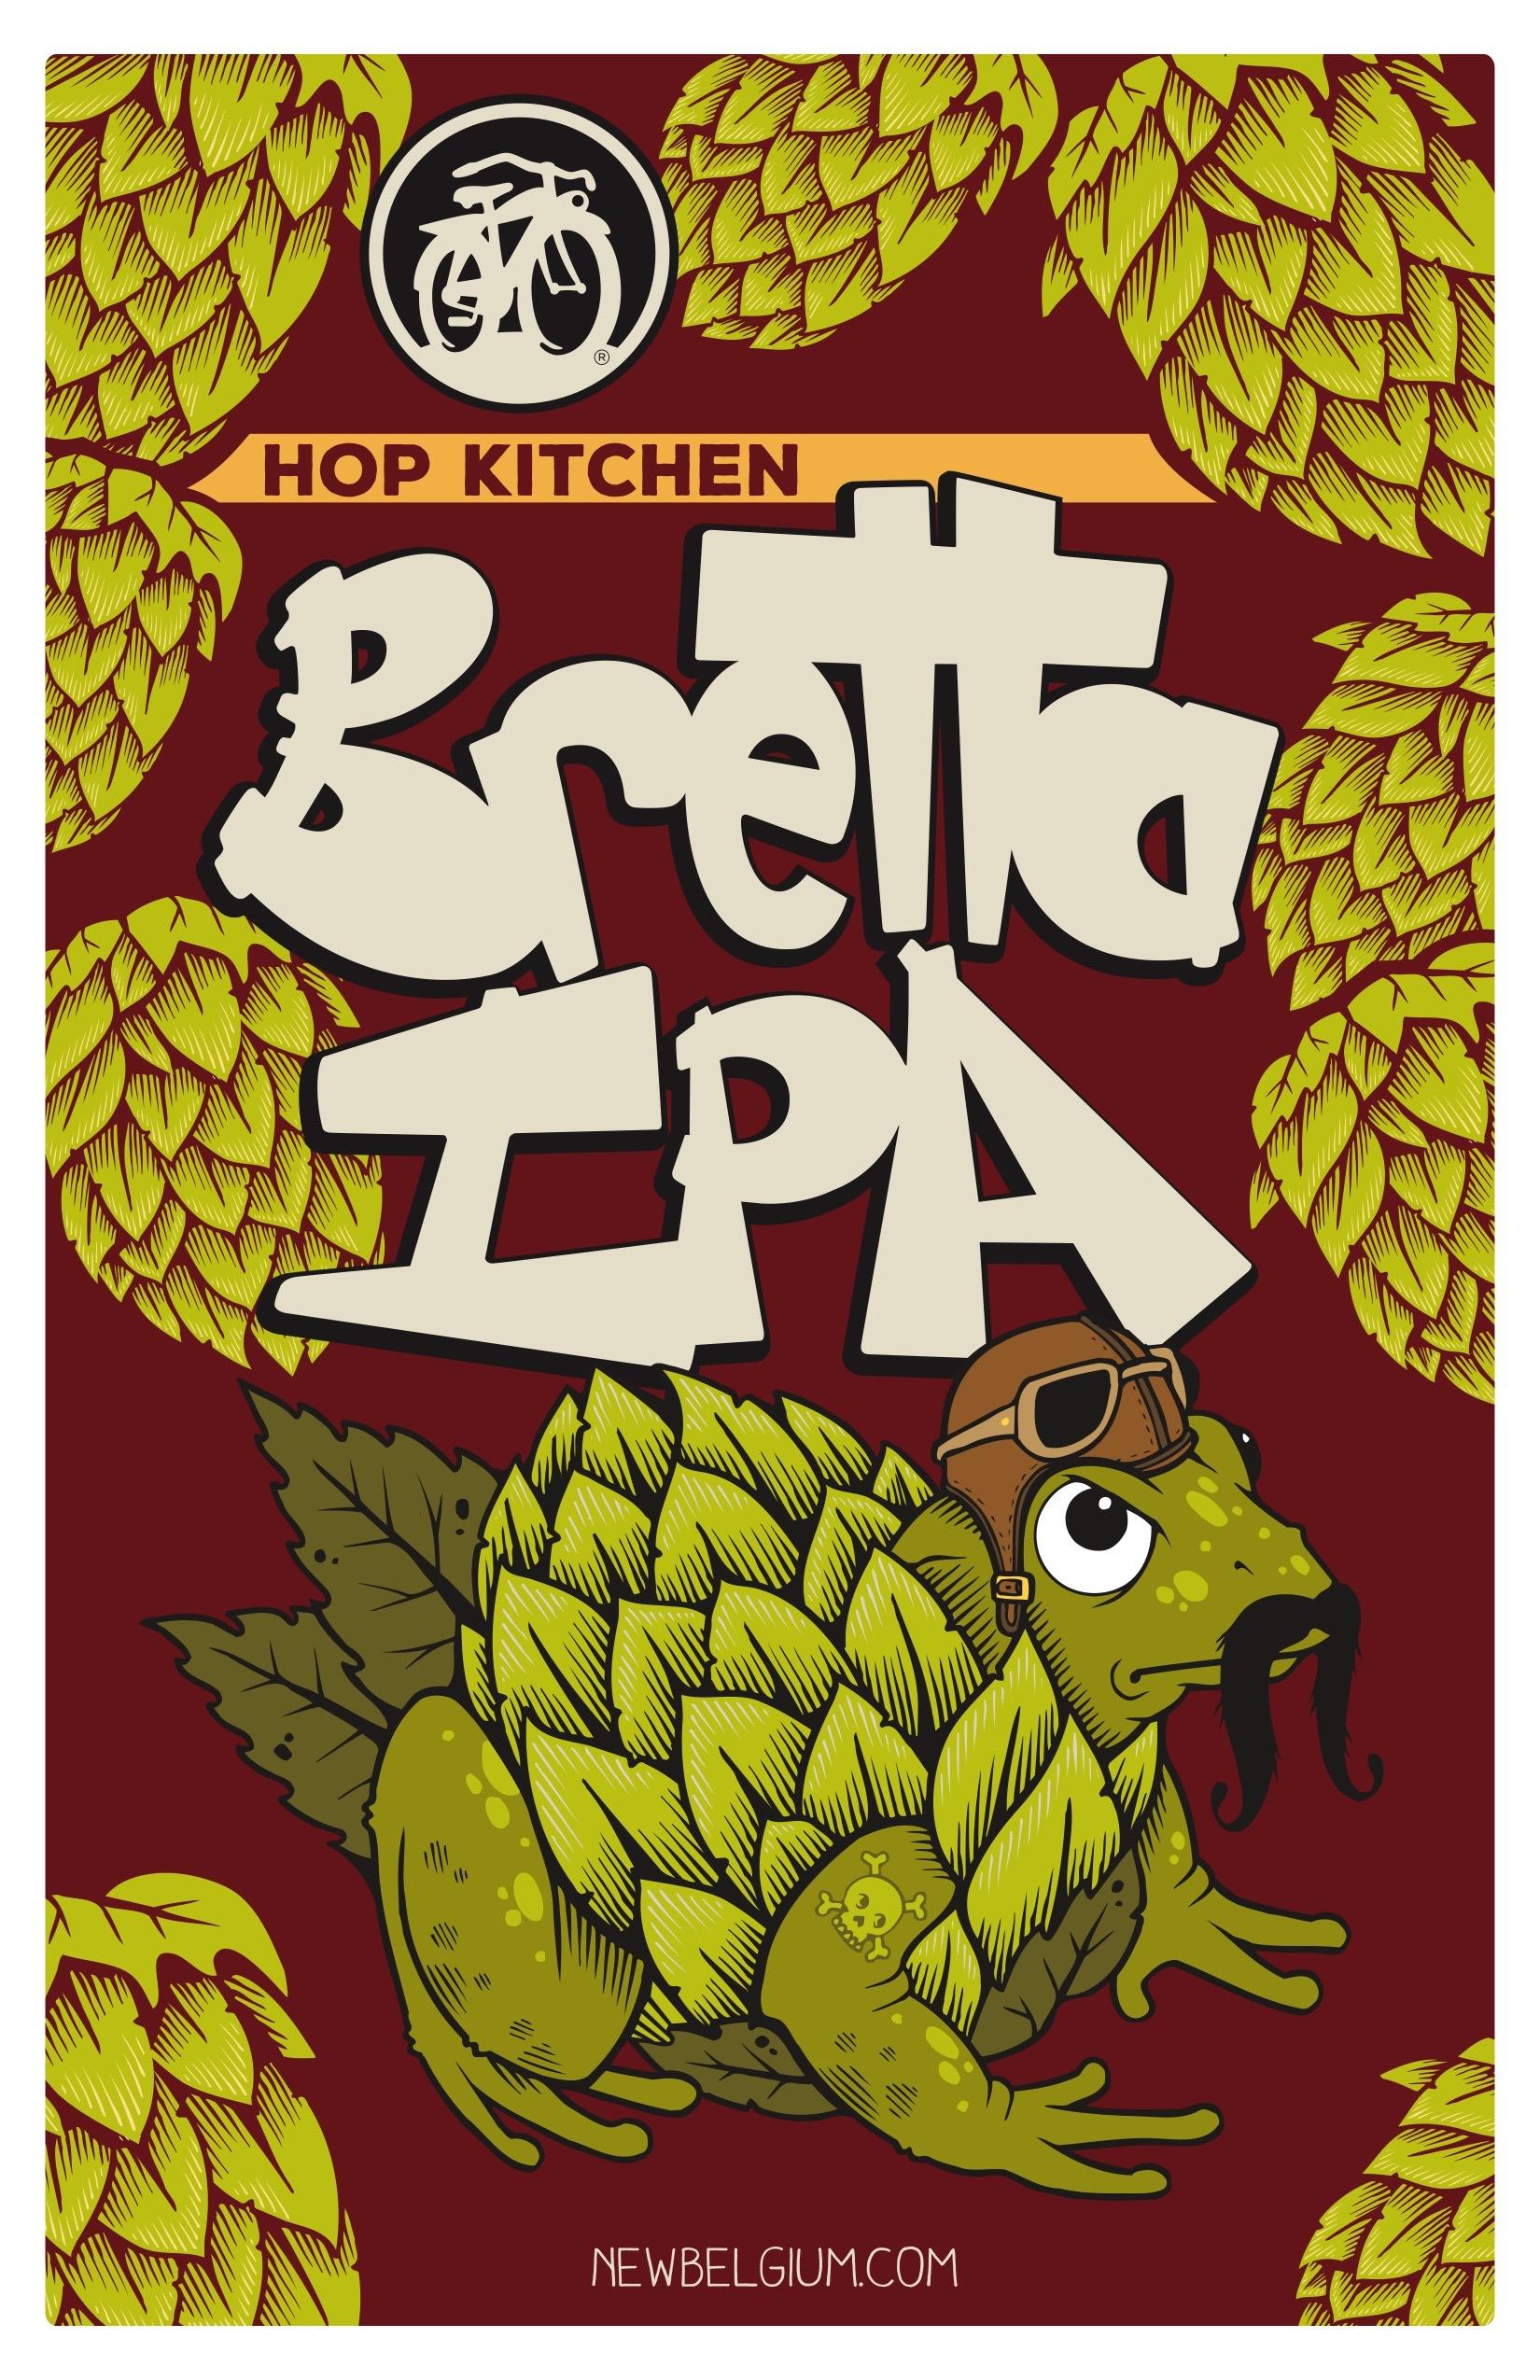 Hop_Kitchen_-_Bretta_IPA_Poster